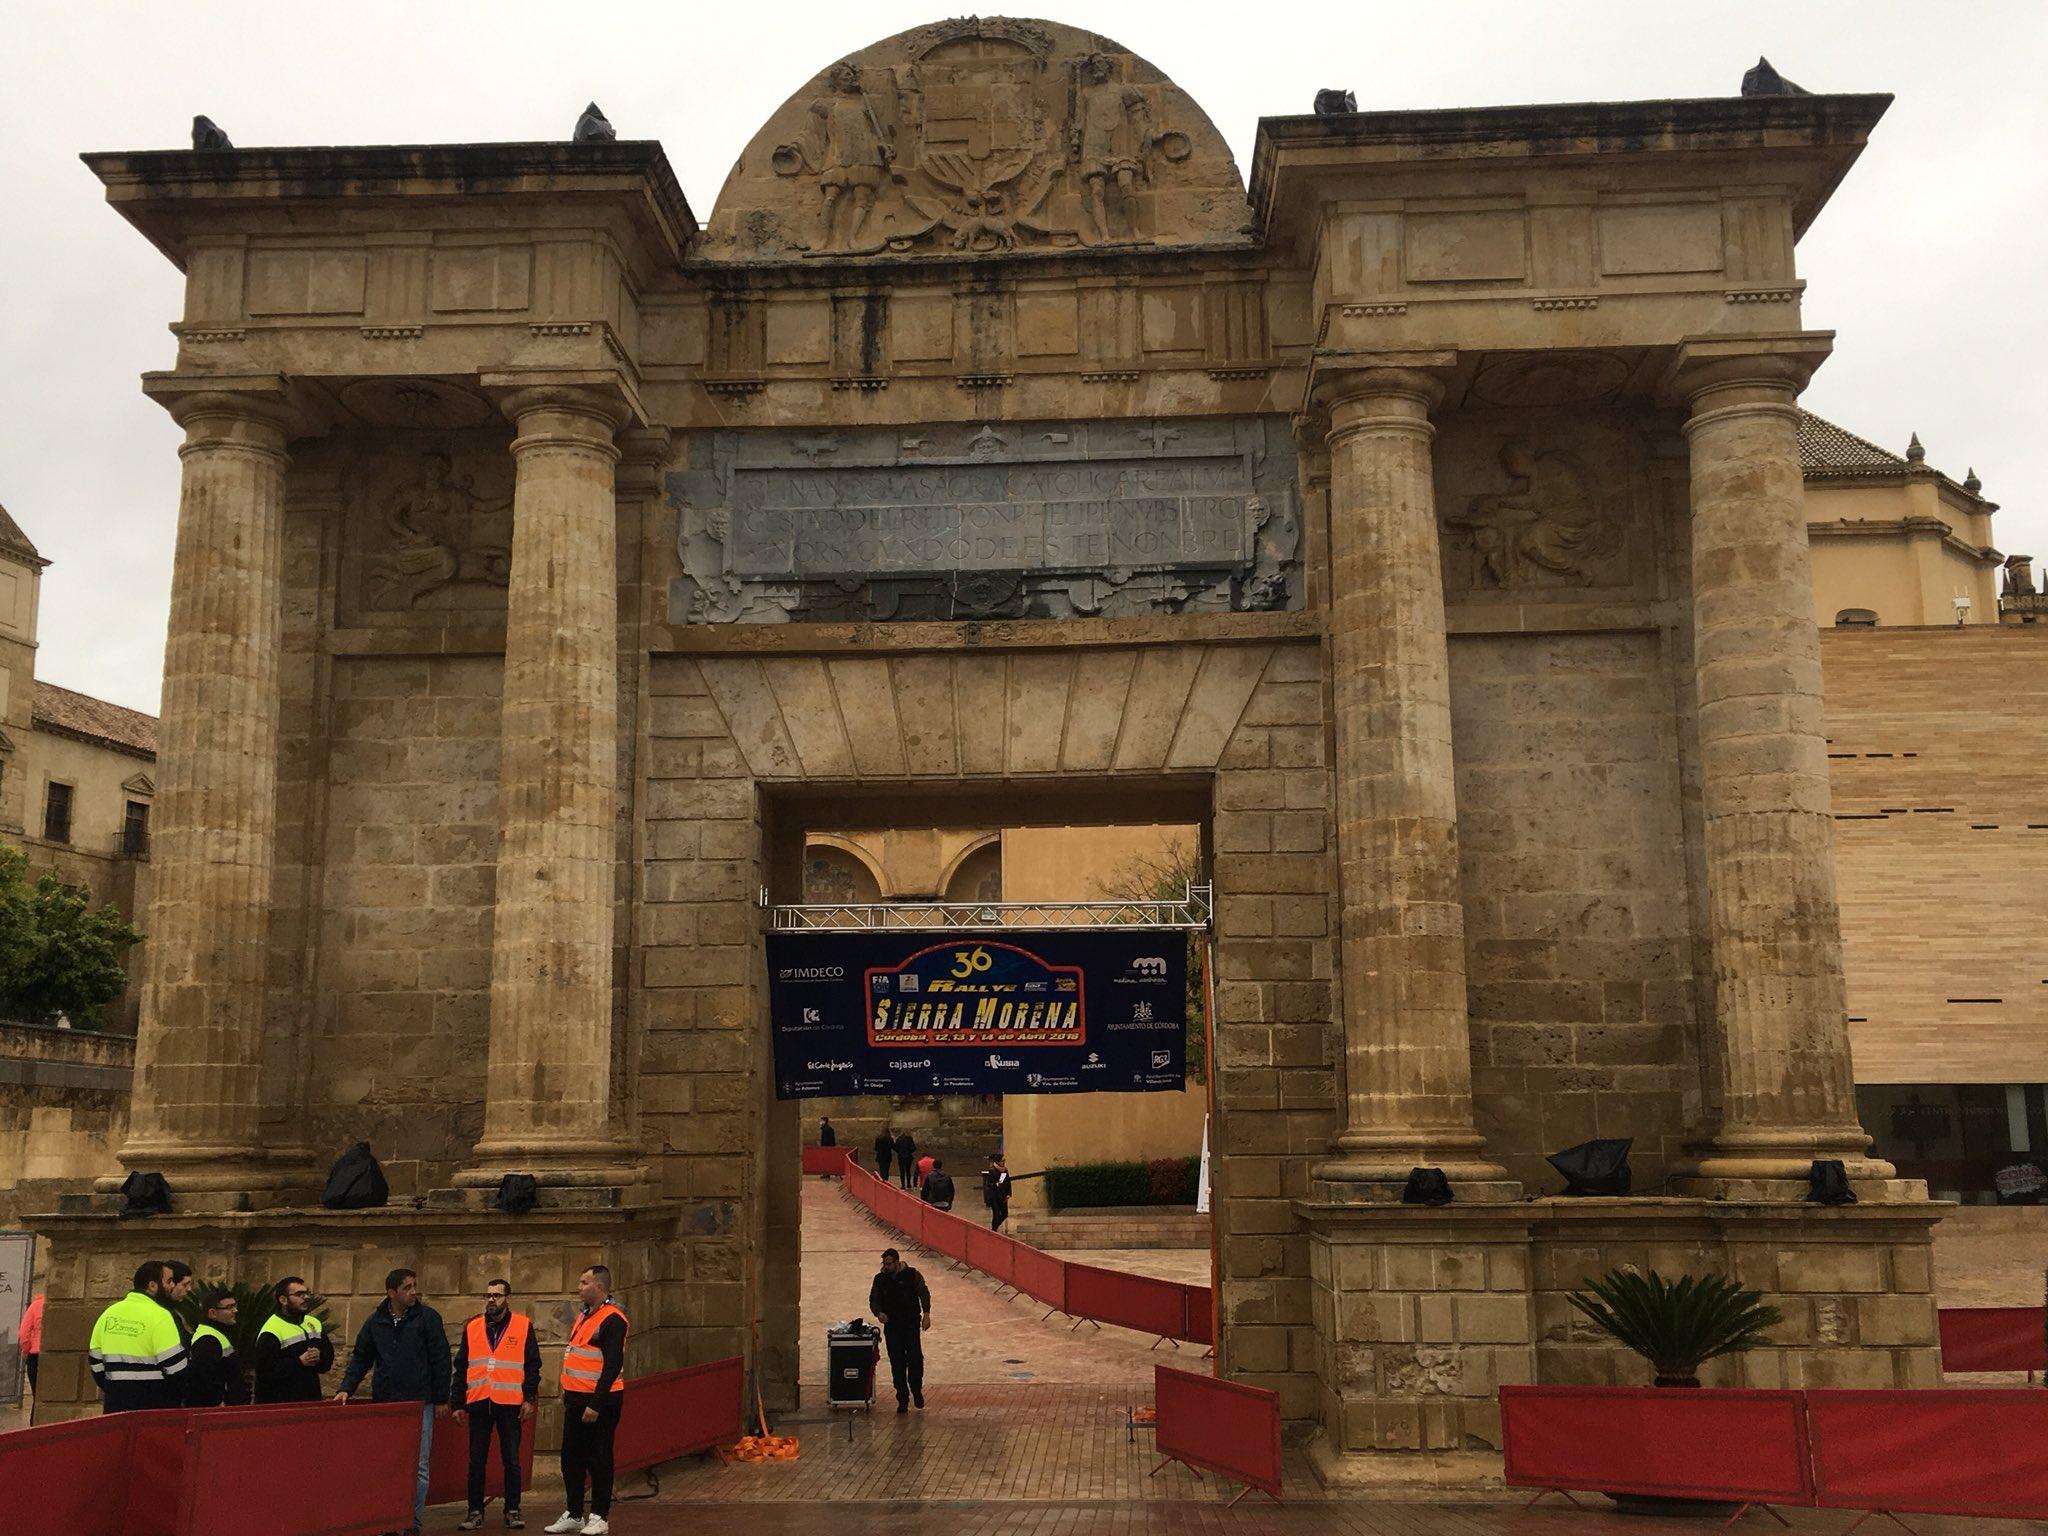 CERA: 36º Rallye Sierra Morena - Internacional [12-14 Abril] - Página 2 DamTkRQWAAA5CYE